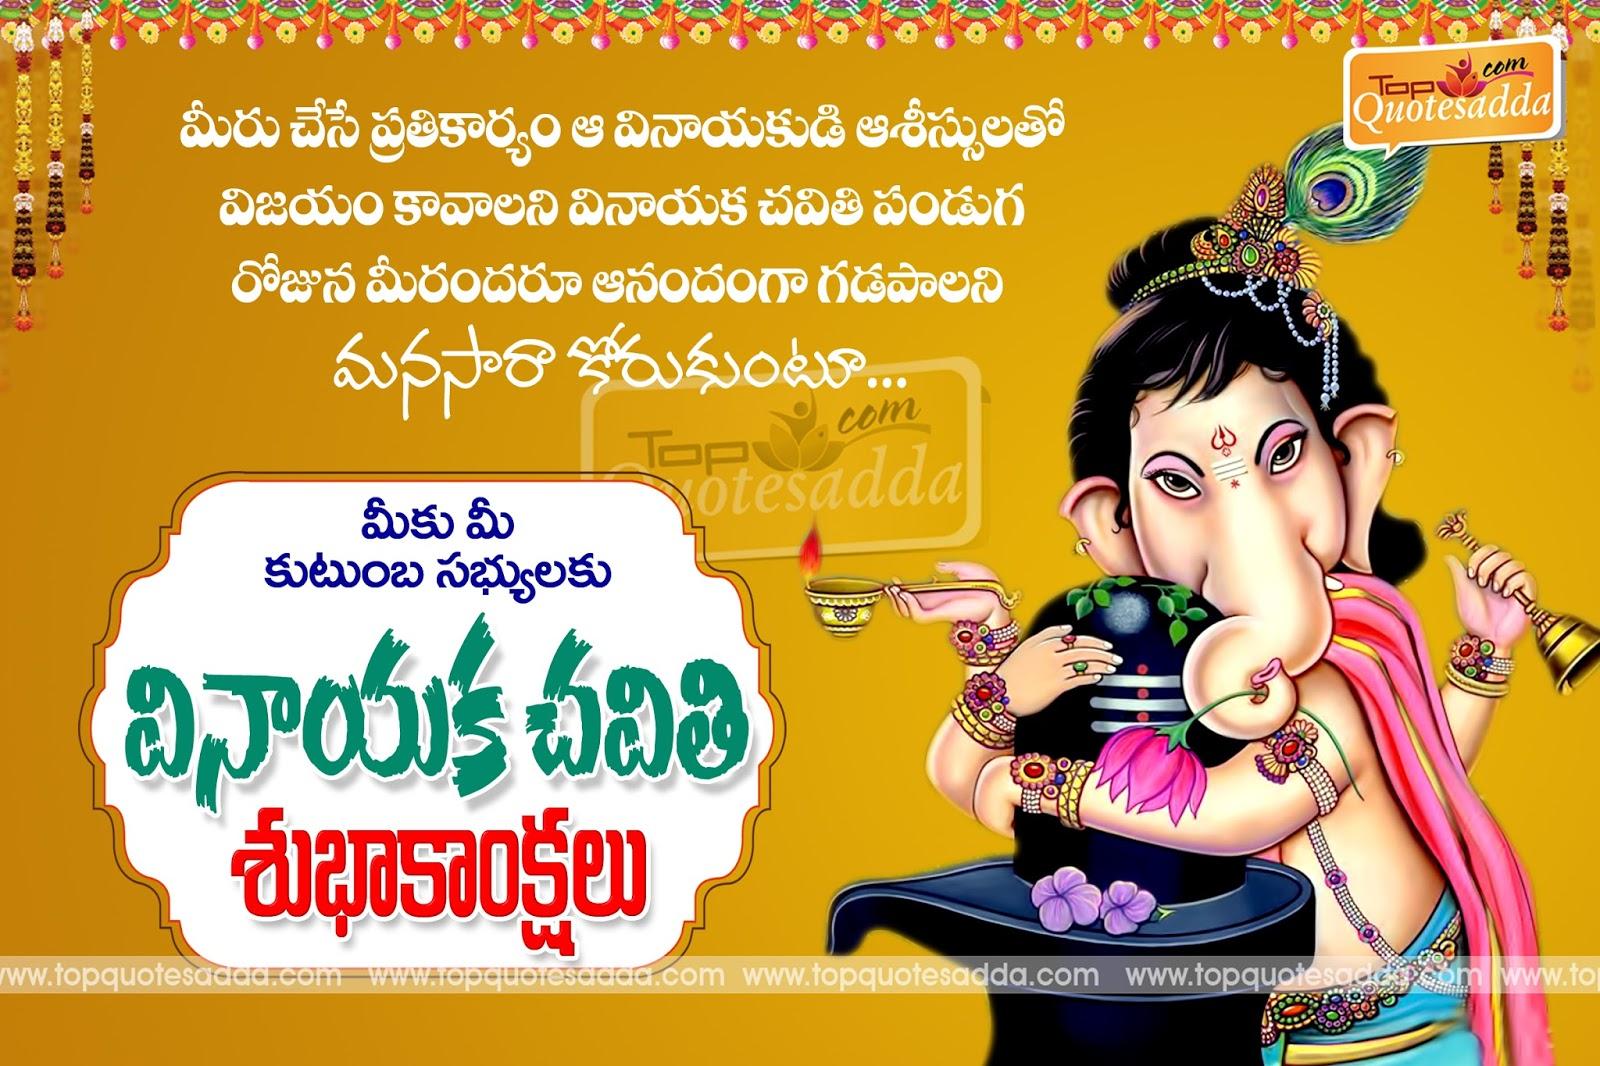 Happy Vinayaka Chaturthi Wishes Quotes In Telugu Topquotesadda